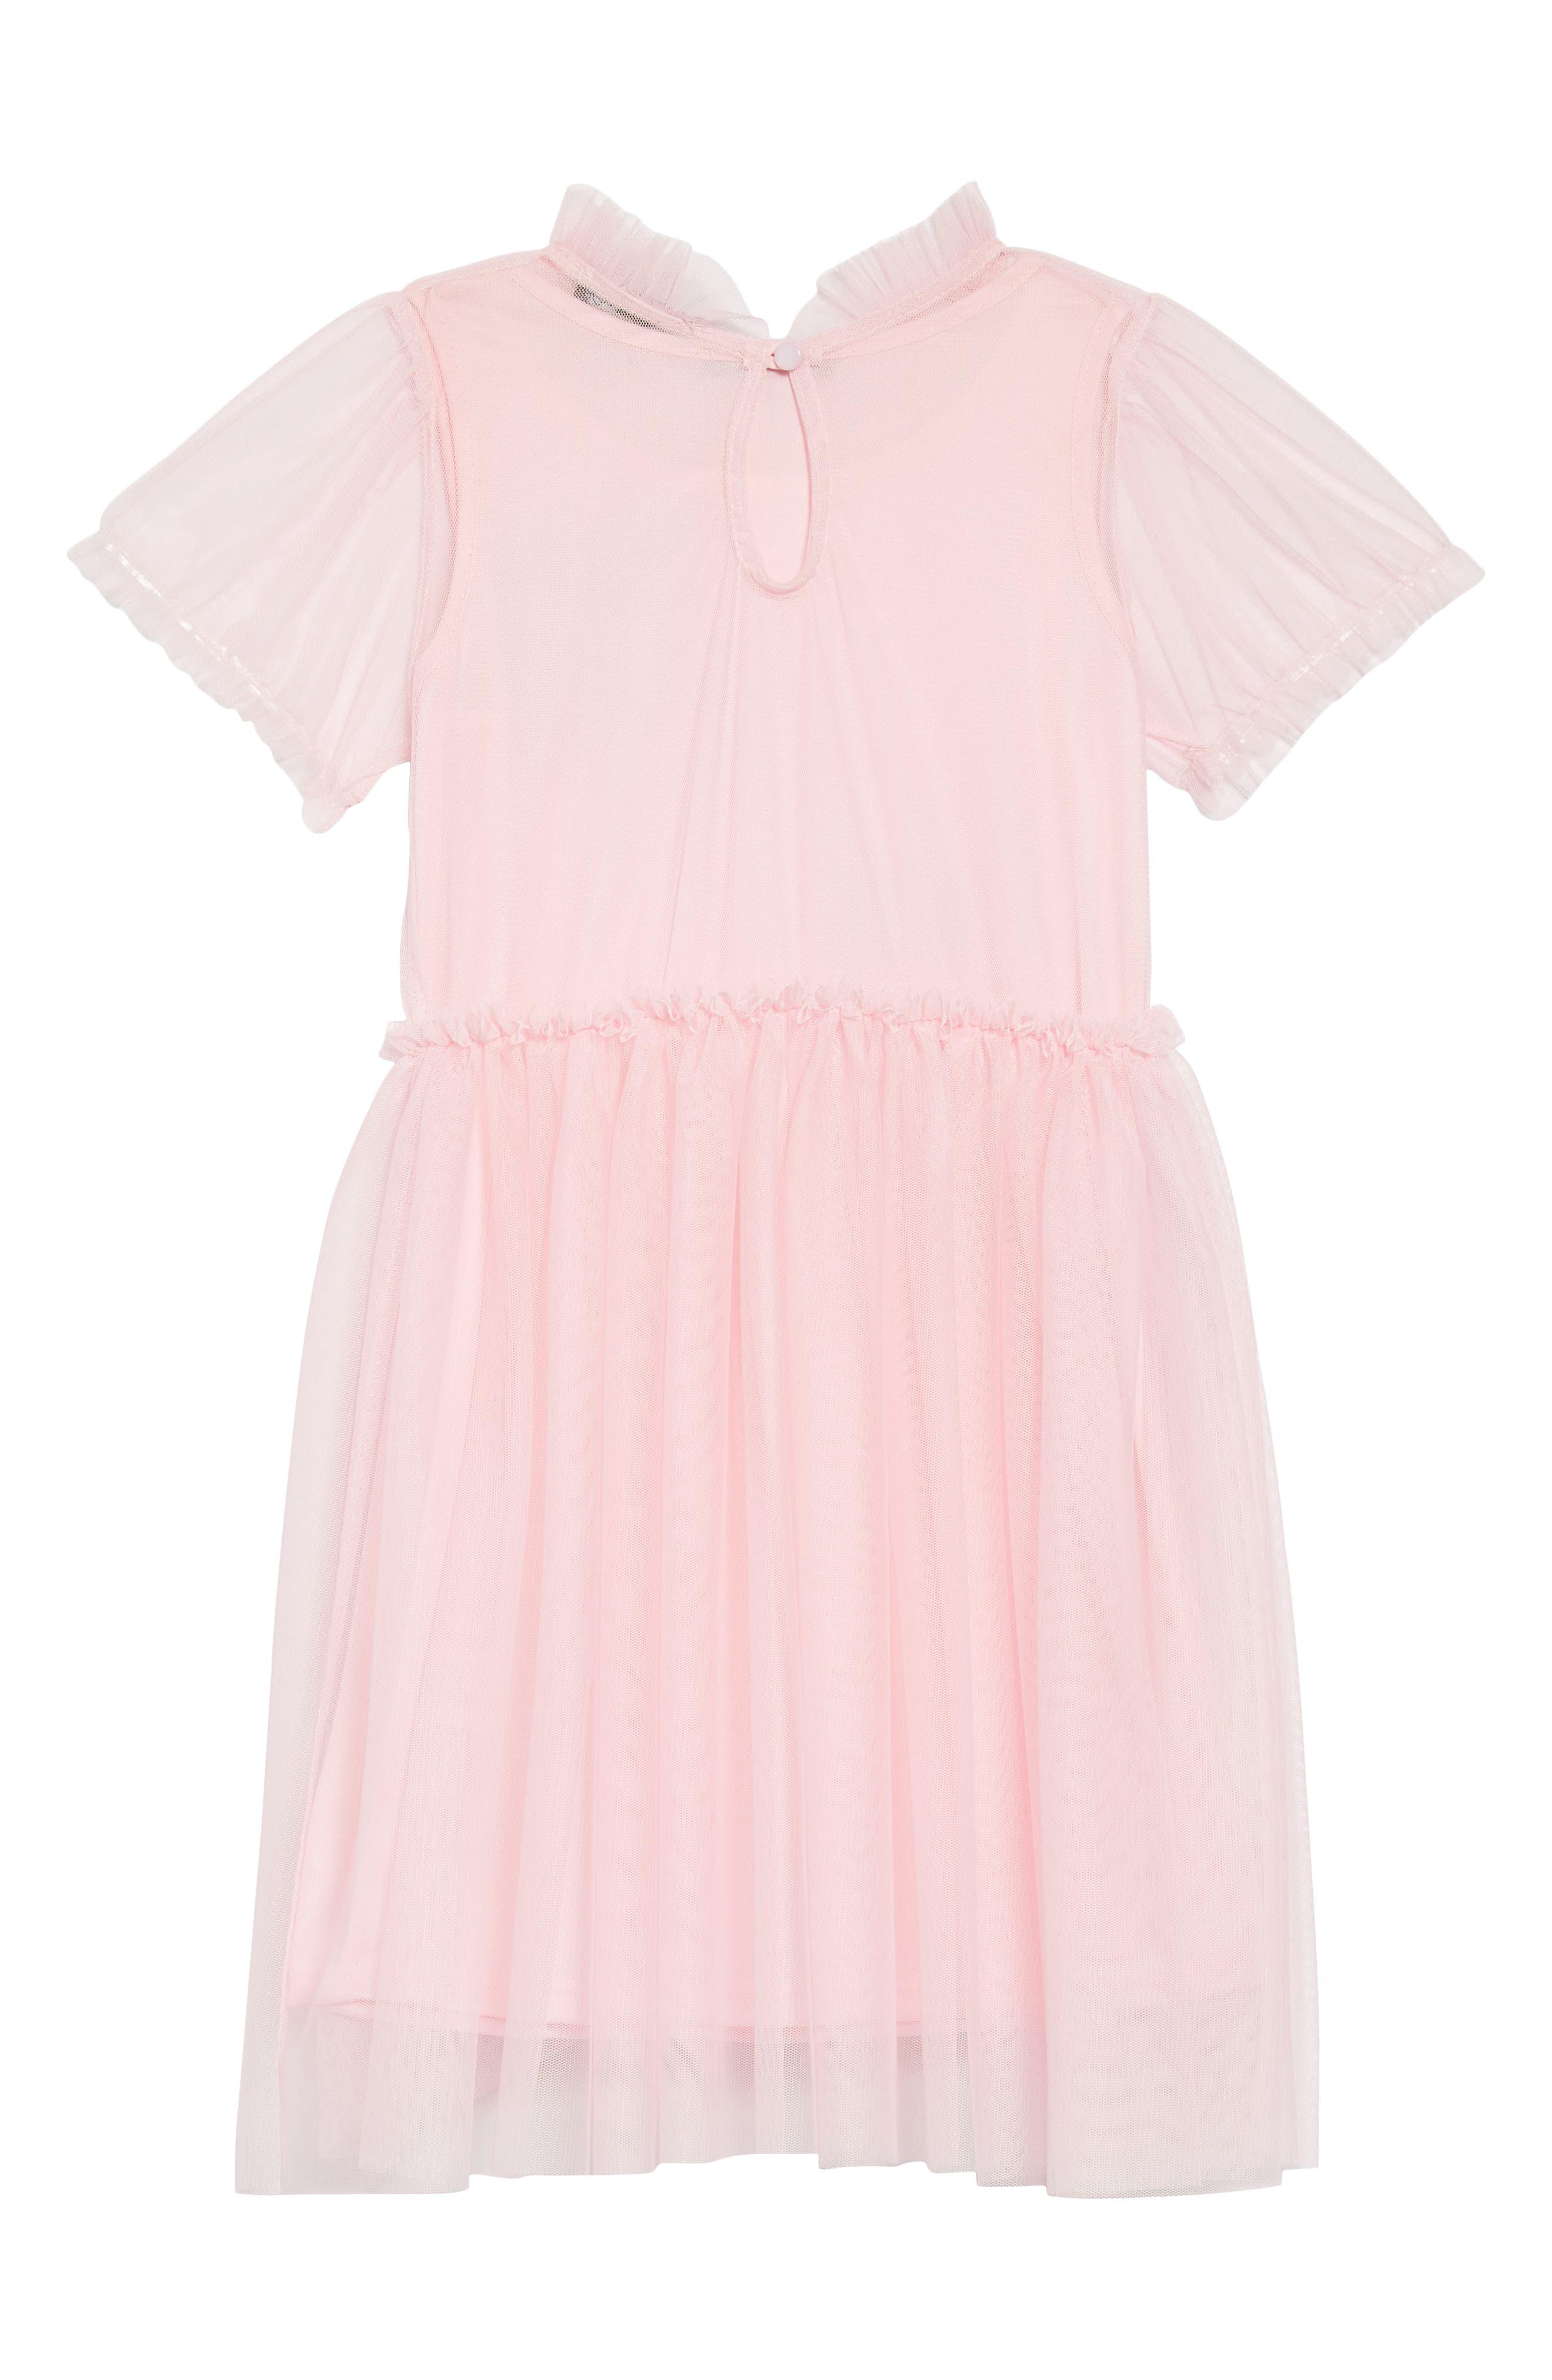 Embellished Tulle Dress,                             Alternate thumbnail 2, color,                             650